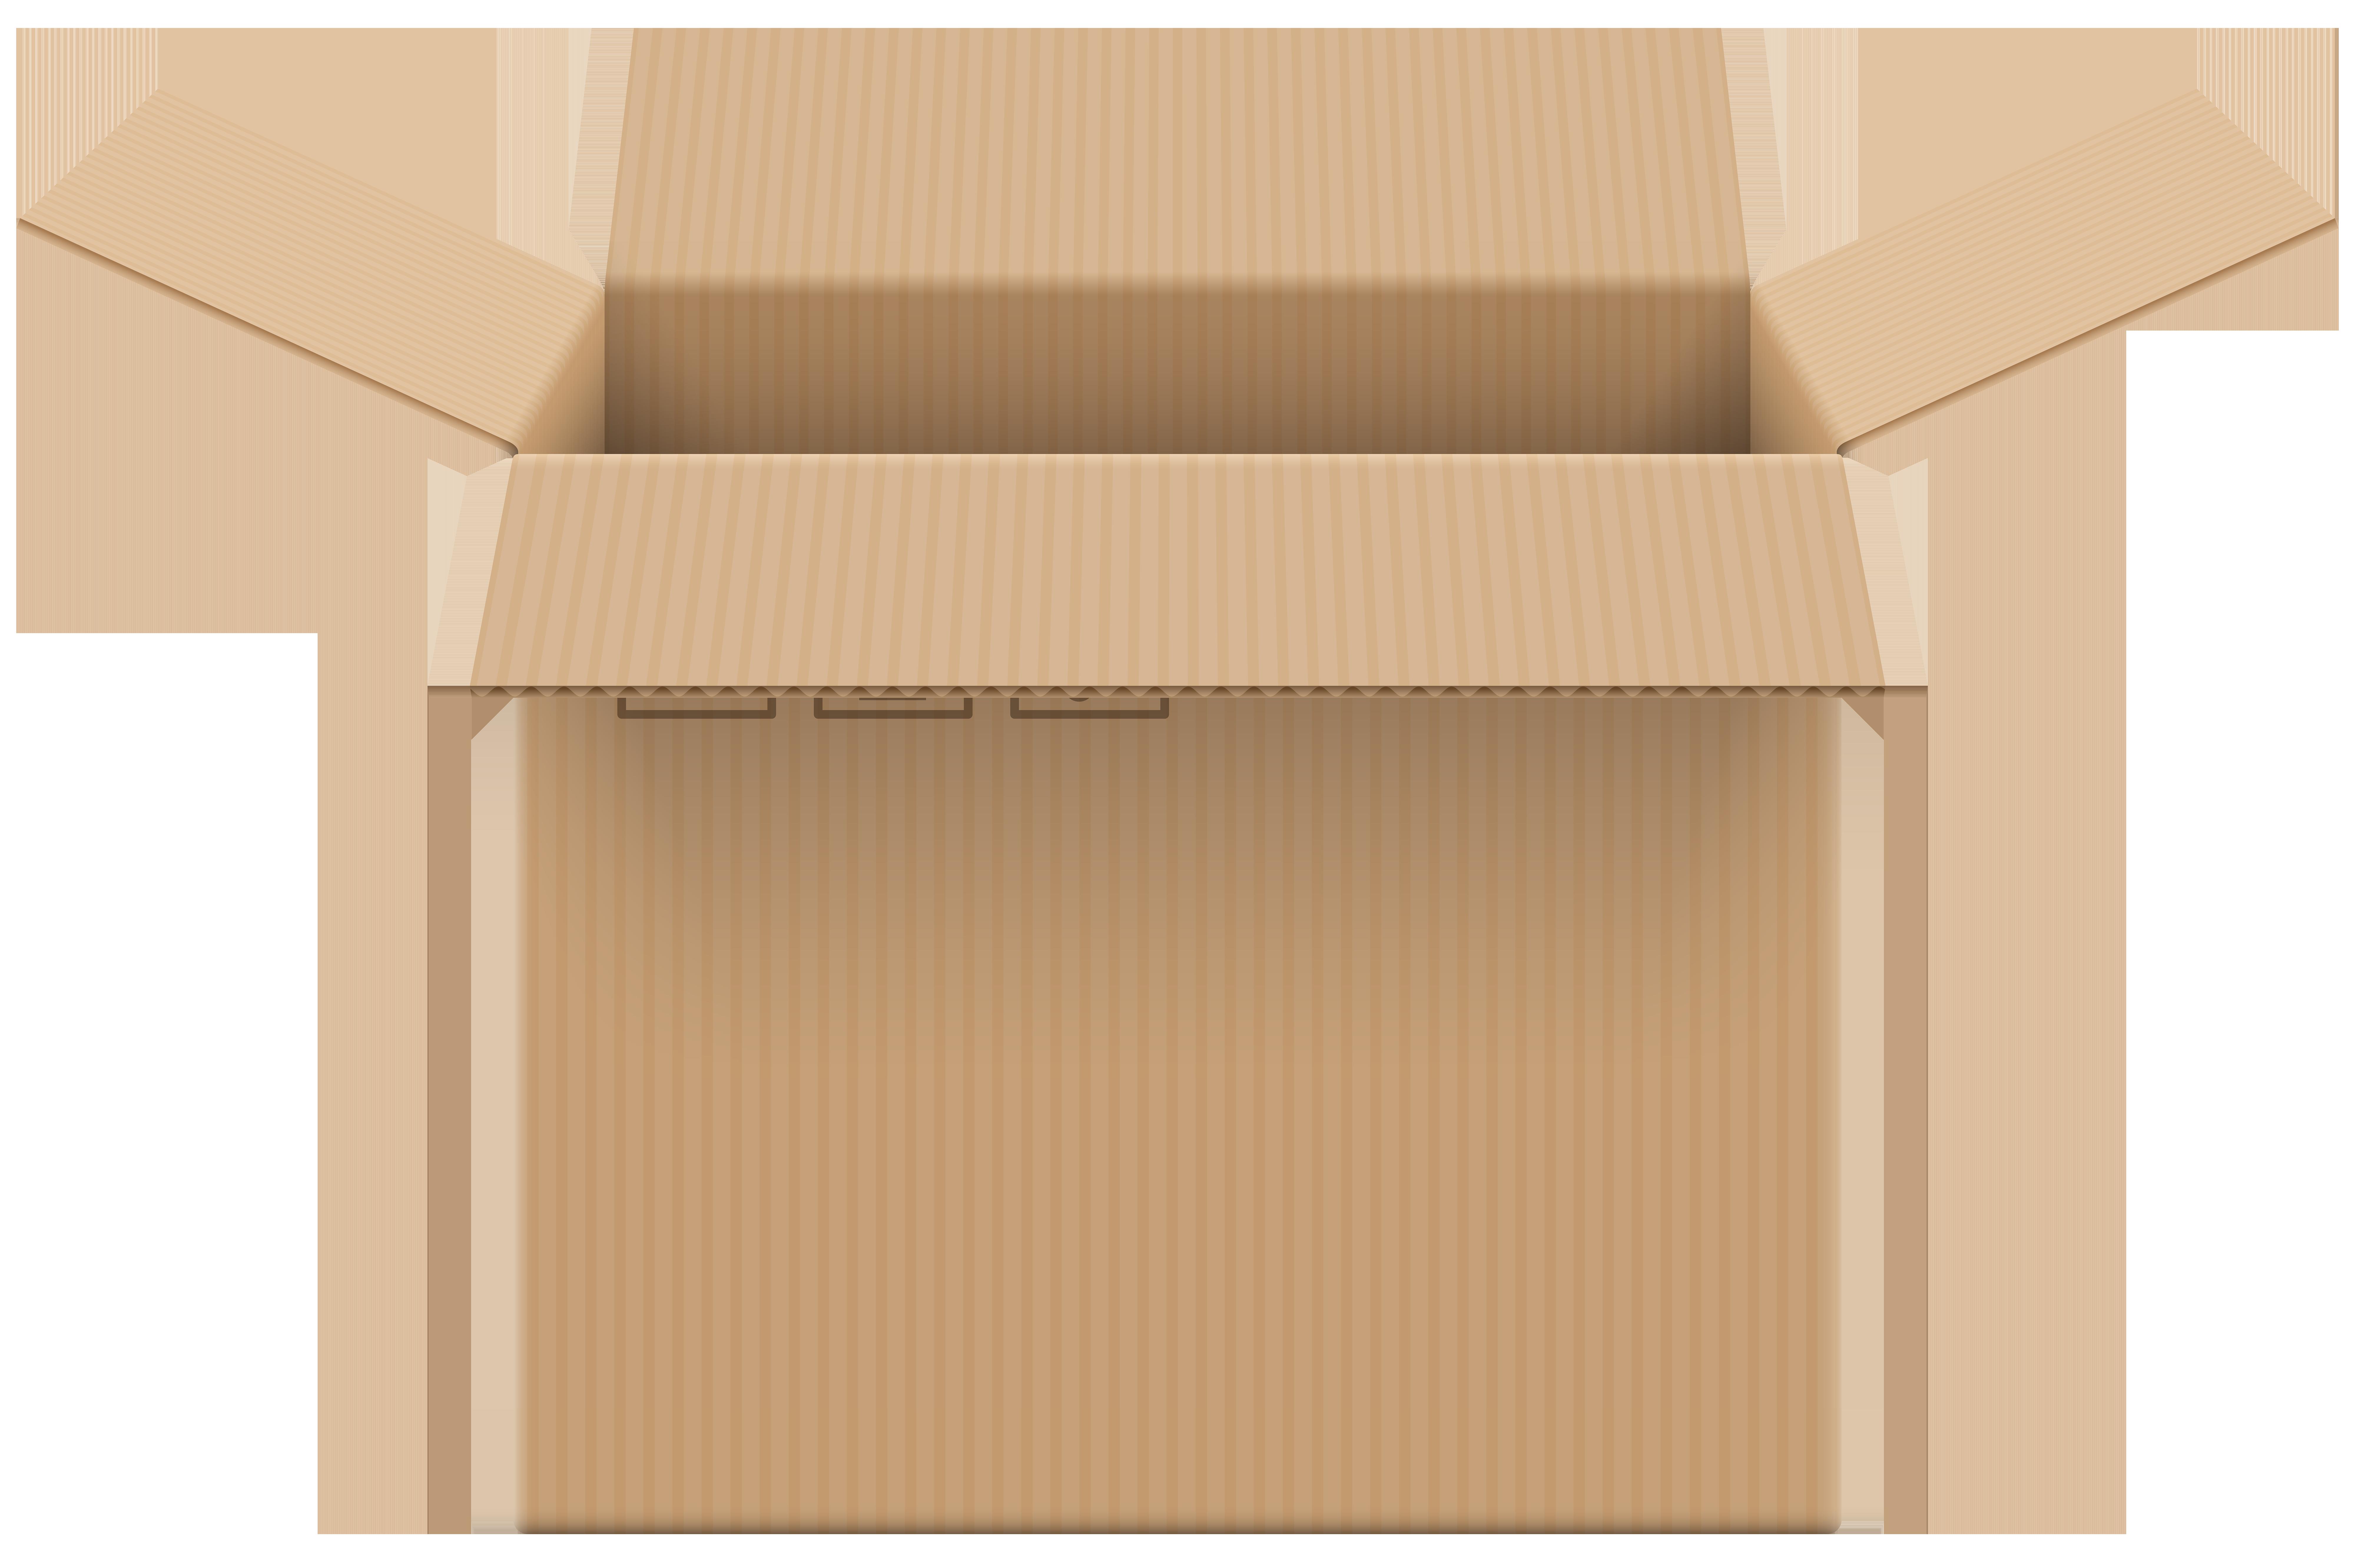 Cardboard Box Open PNG Clip Art.